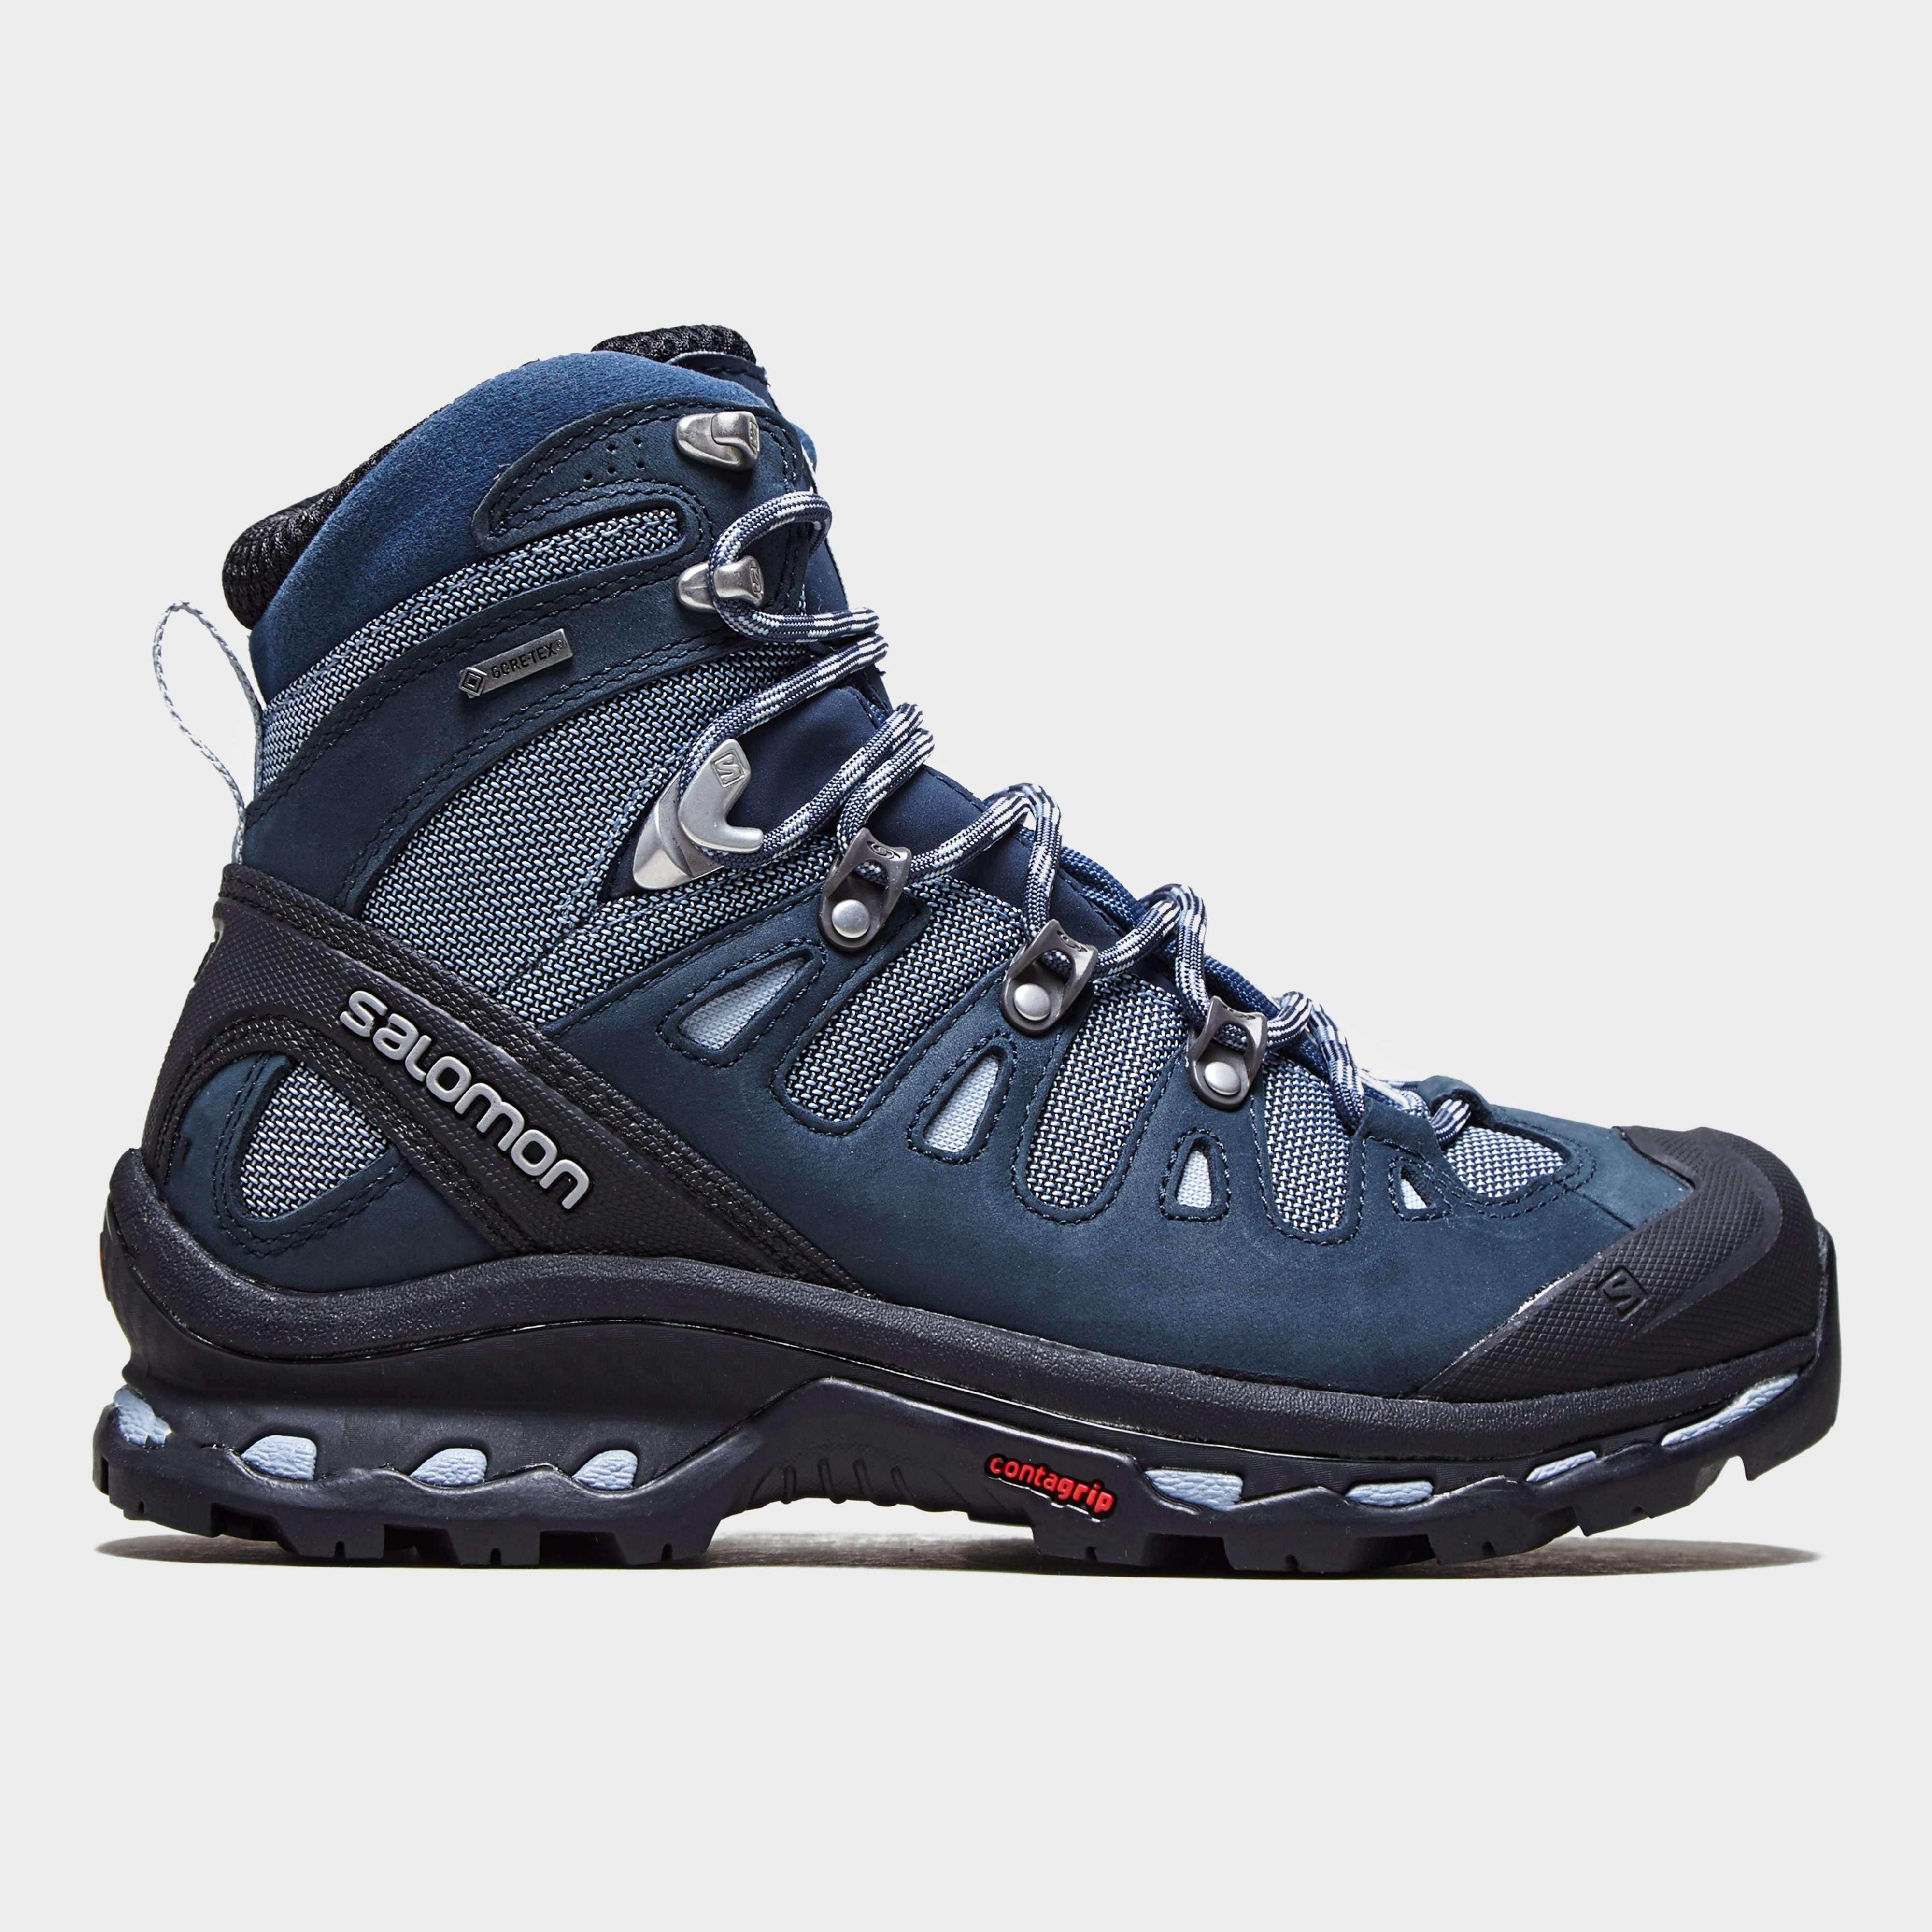 SALOMON Women's Quest 4D 2 GORE-TEX® Hiking Boot